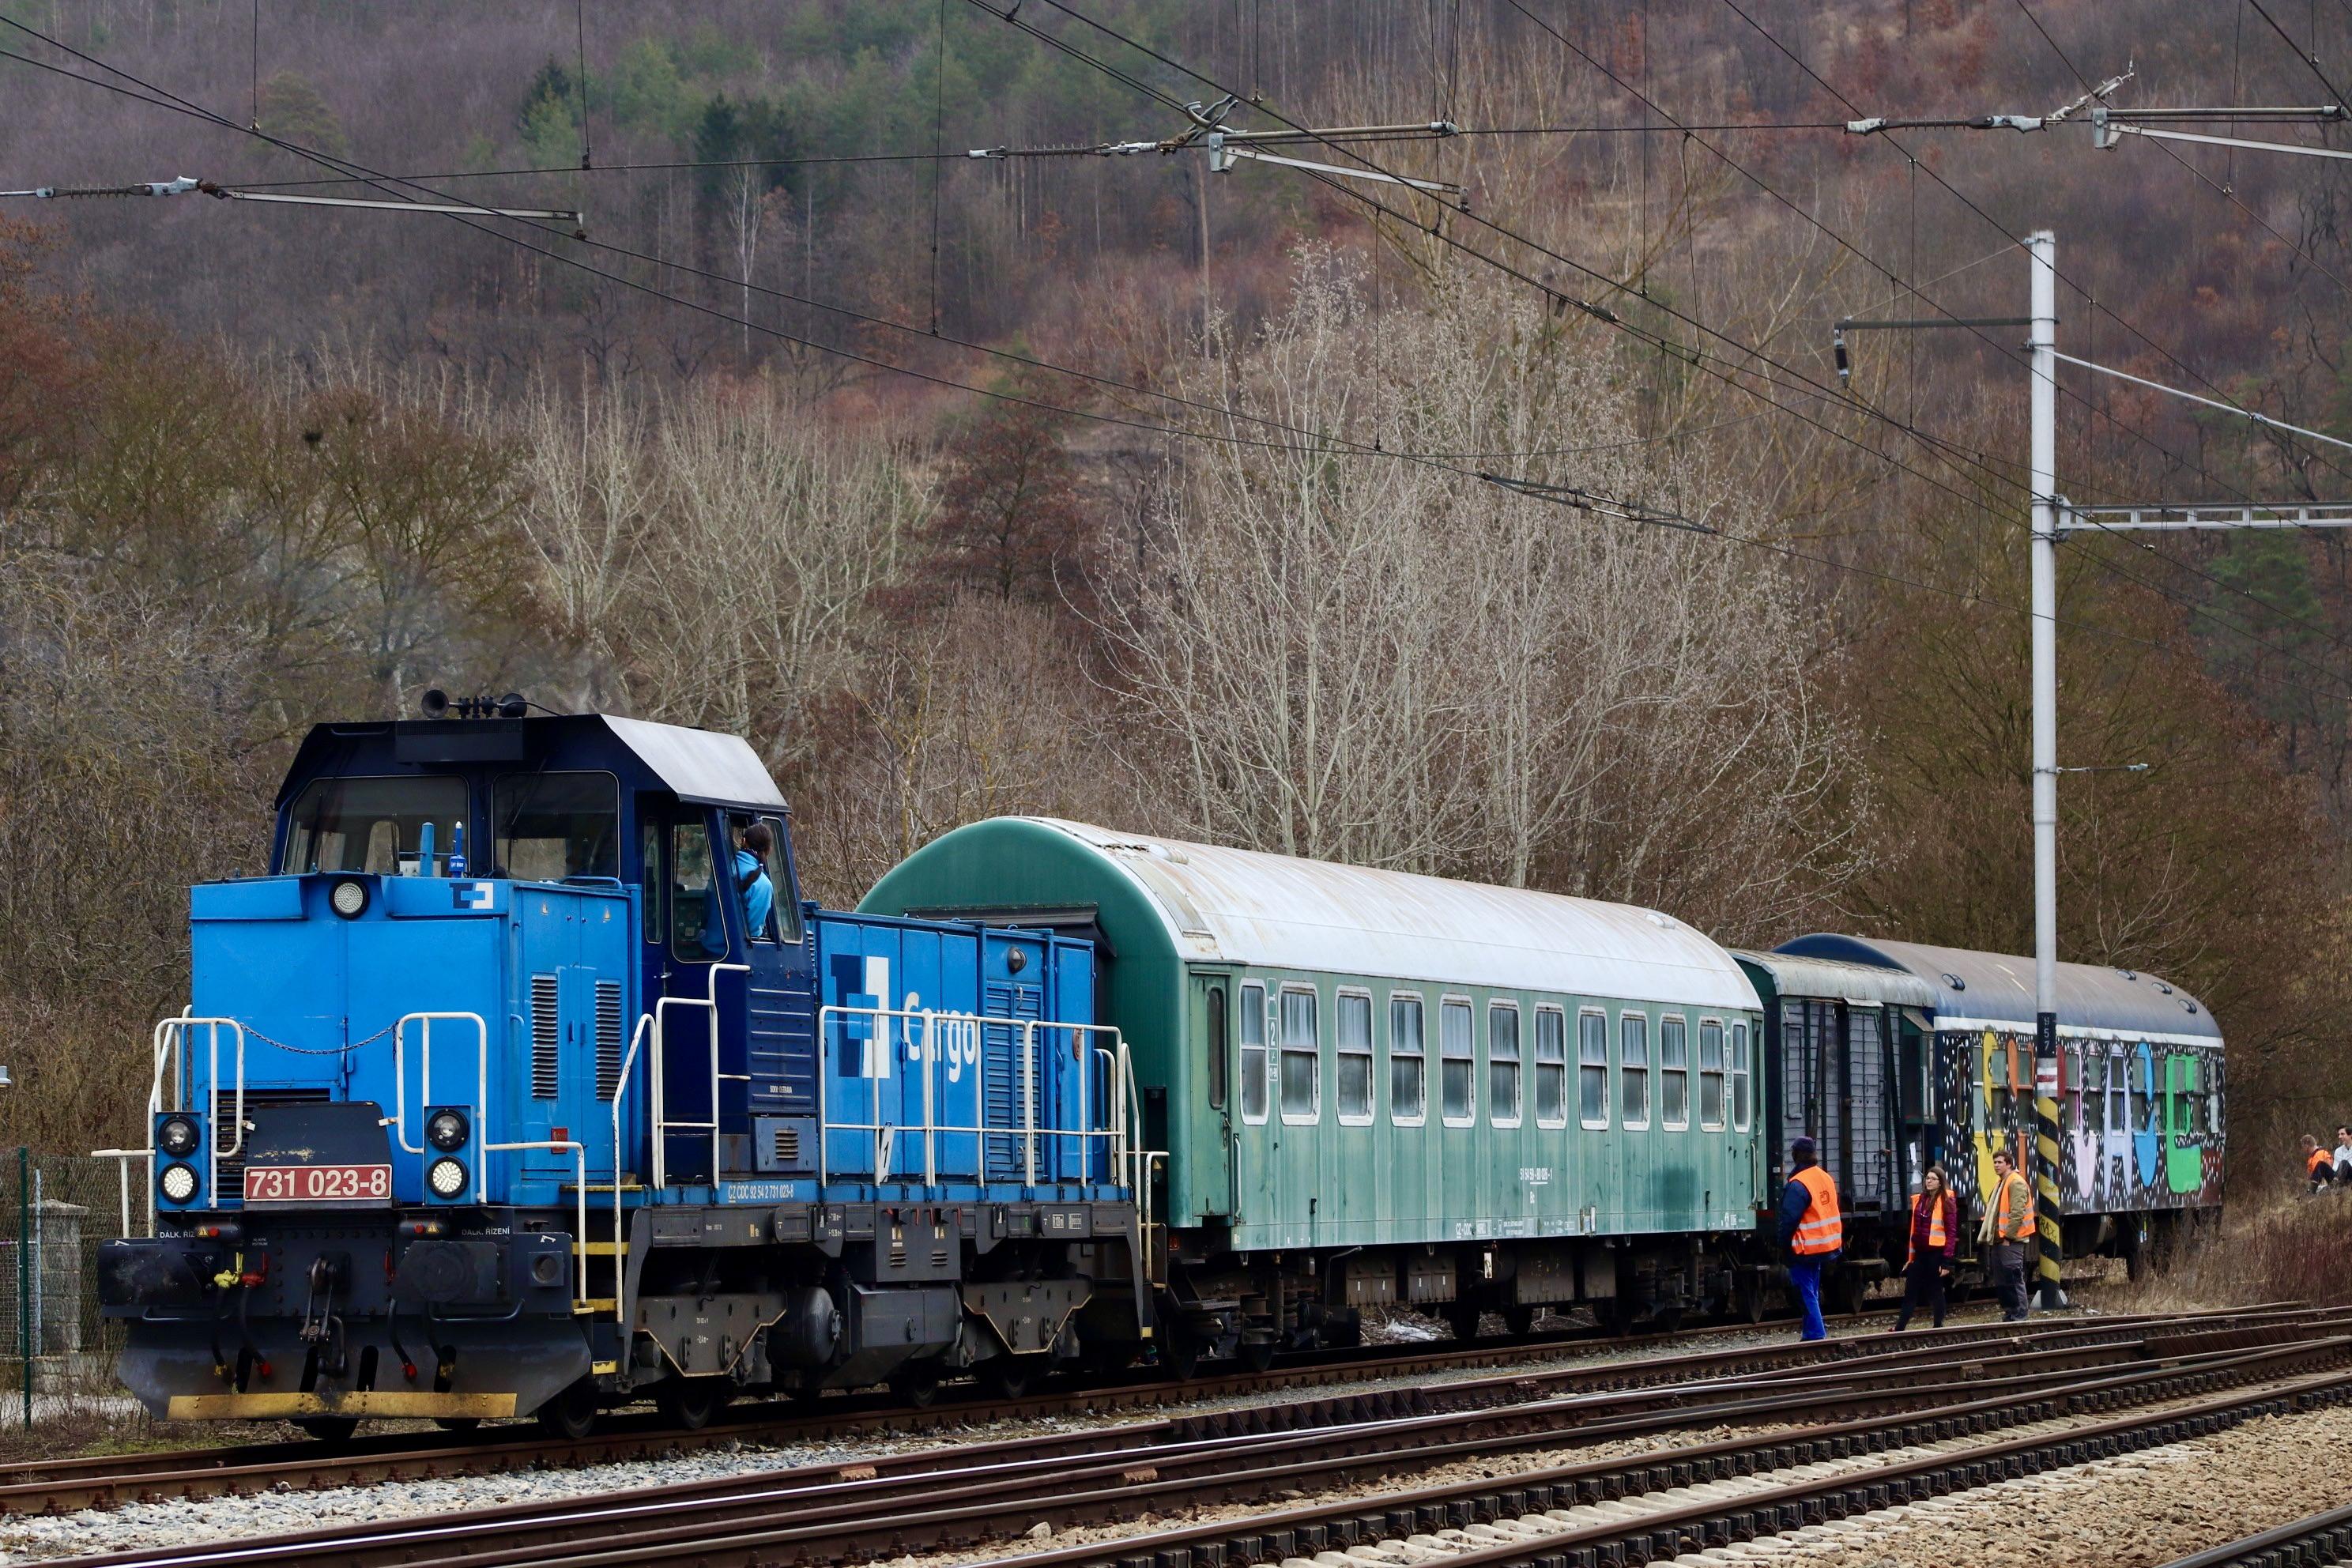 zeleznicni uderka vlakfest